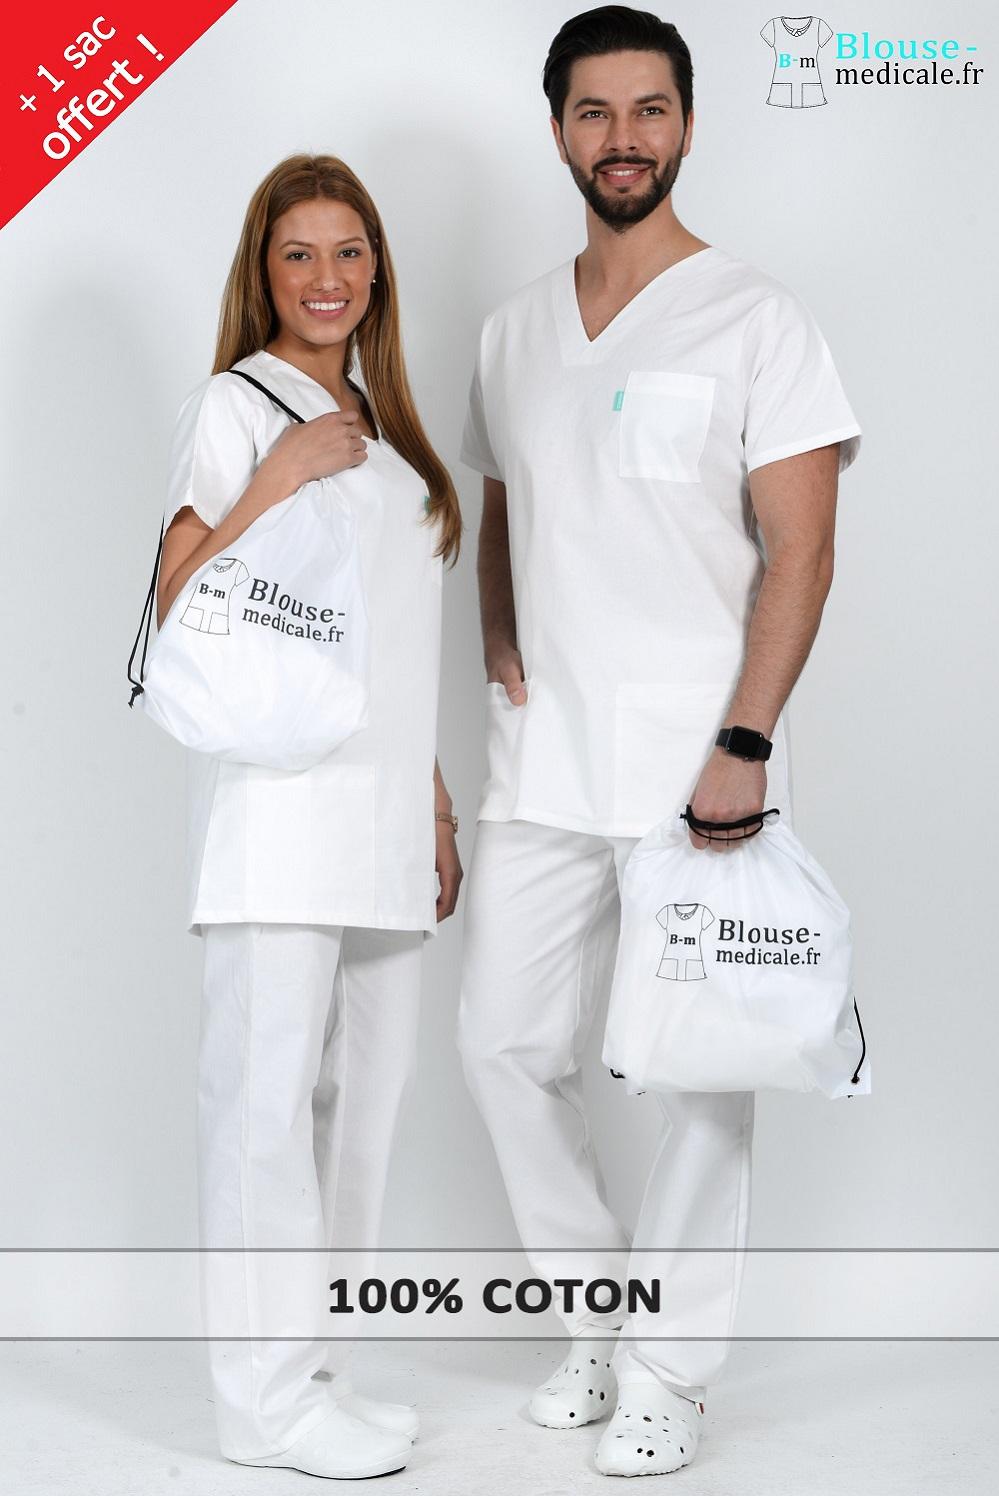 tenue medicale hopital tenue hospitaliere pas cher blouse medicale promo